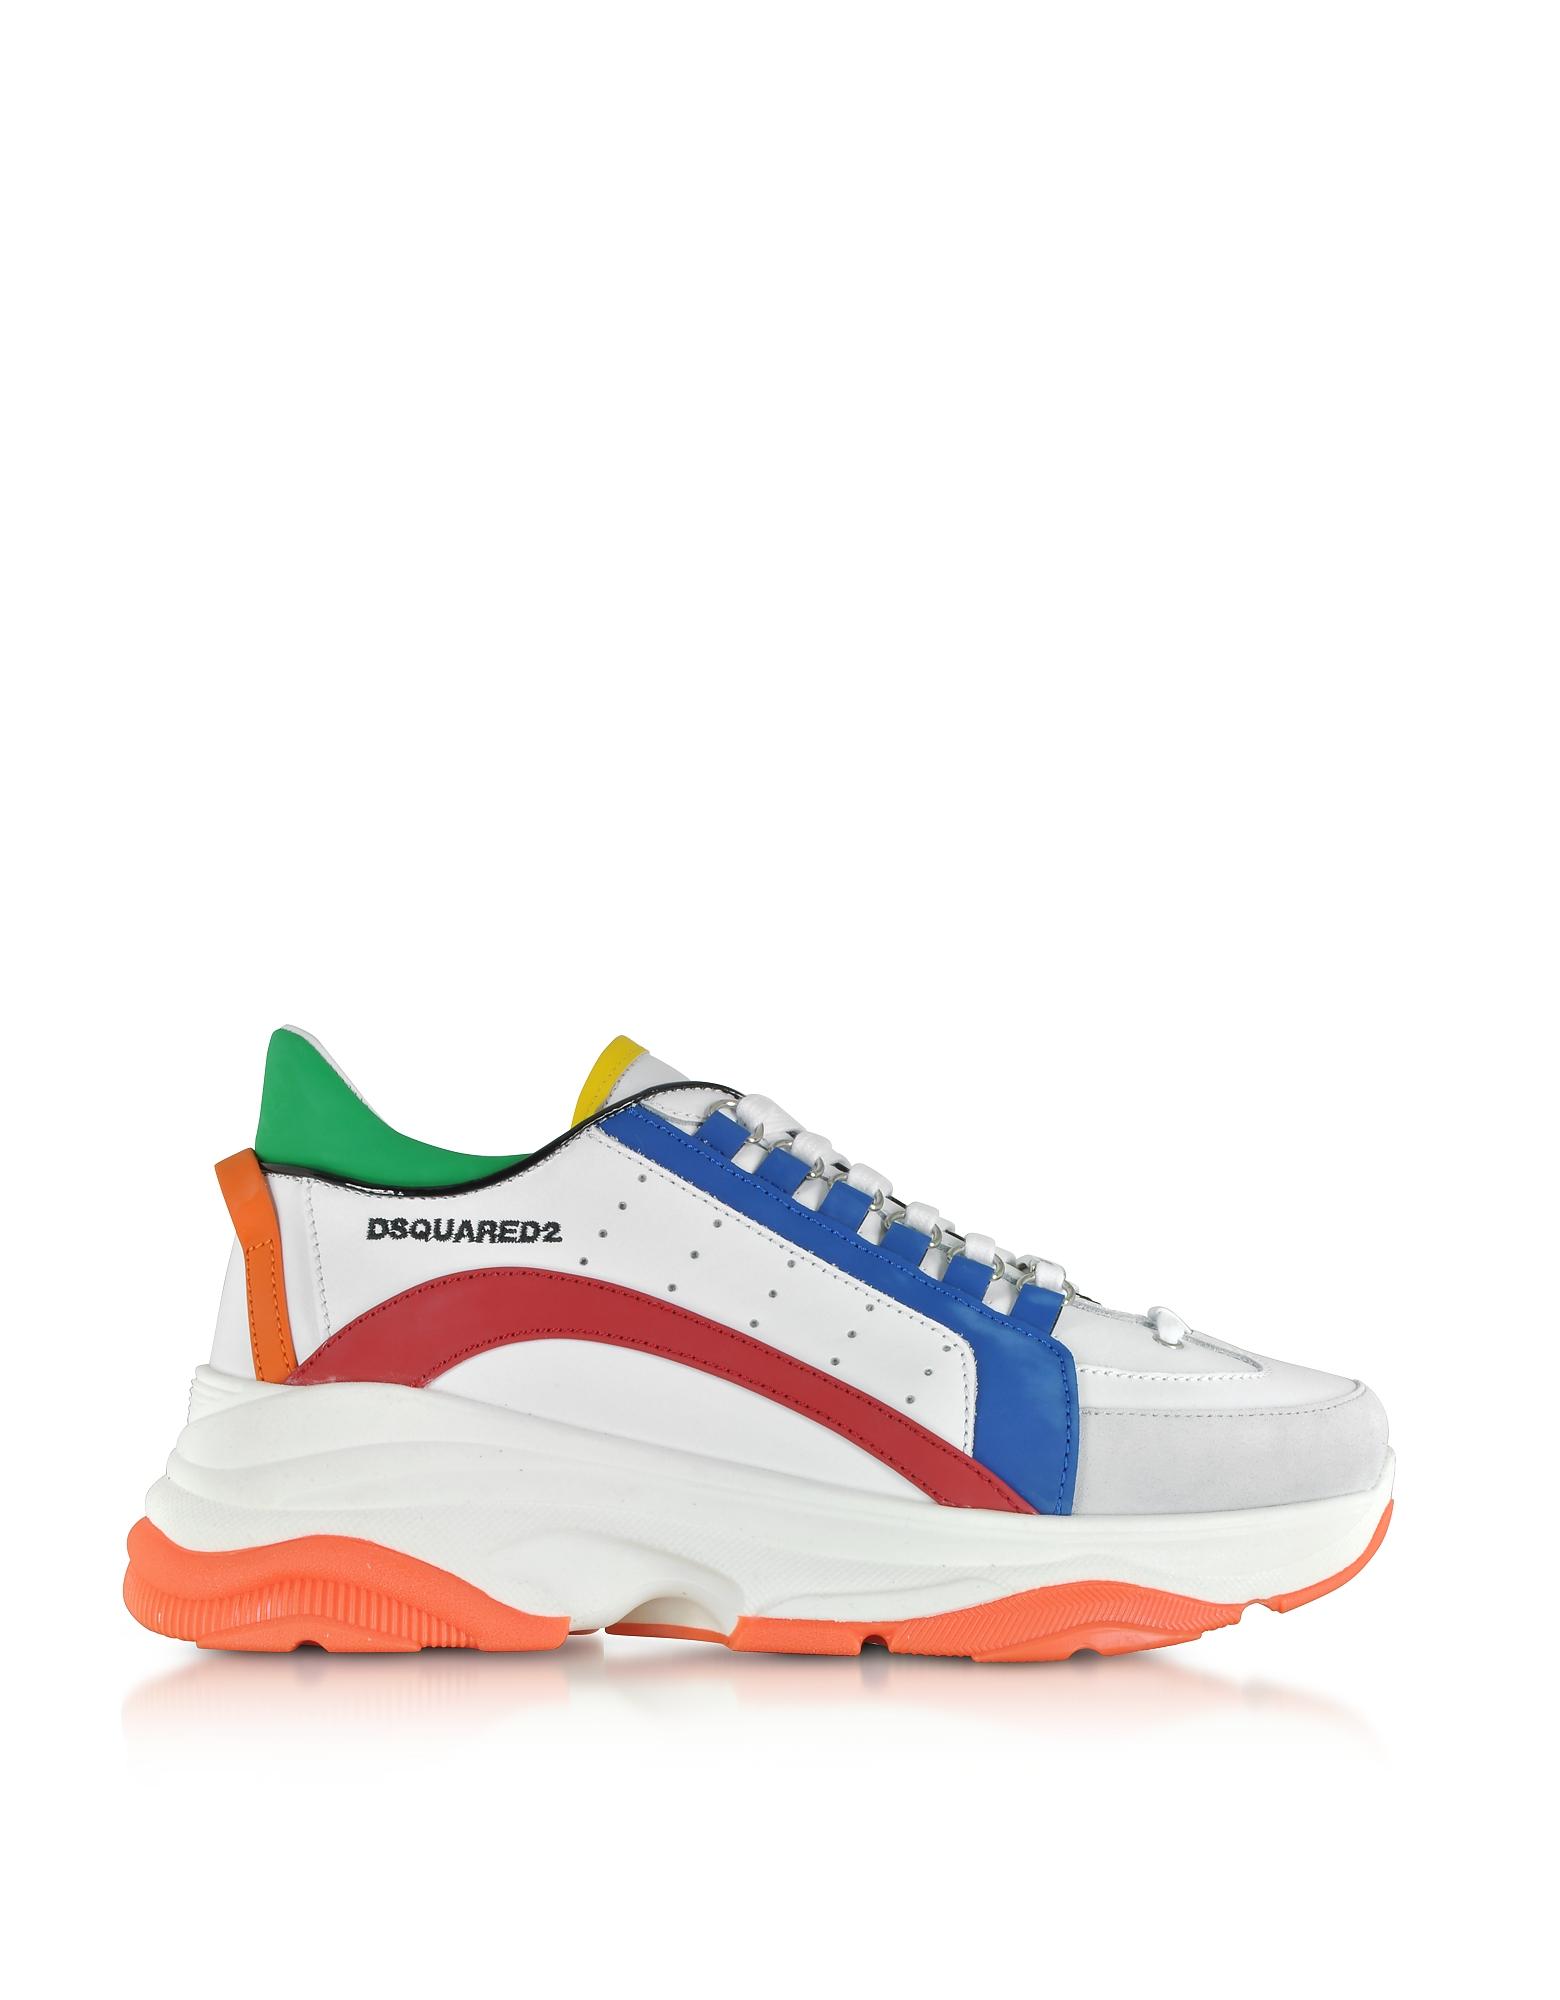 Bumpy 551 Gommato Leather Men's Sneakers